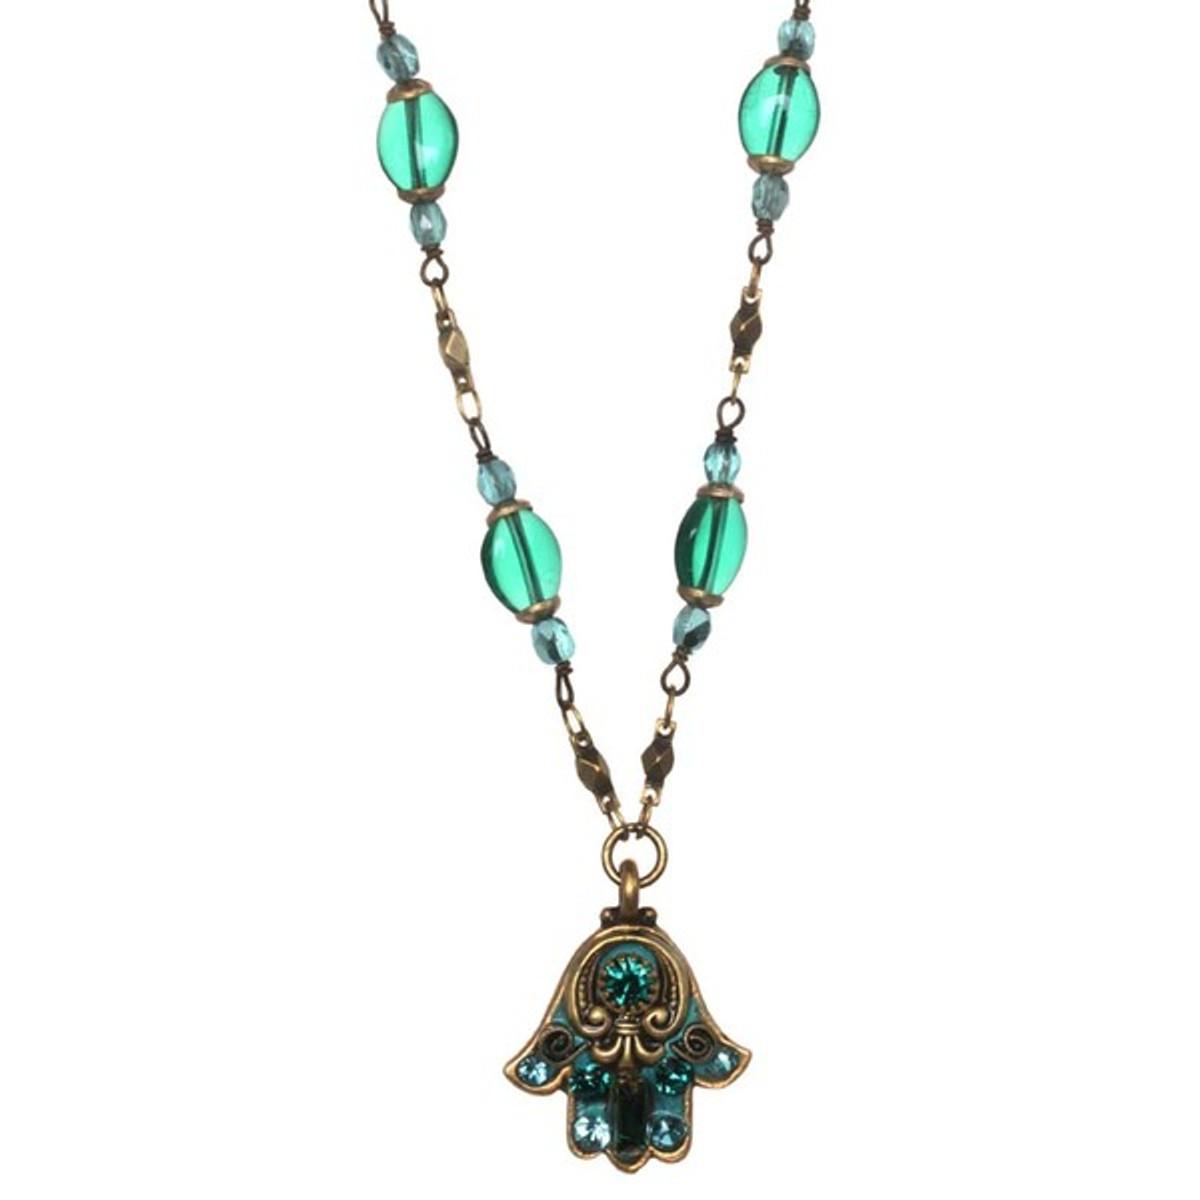 Michal Golan Small Green Hamsa Necklace